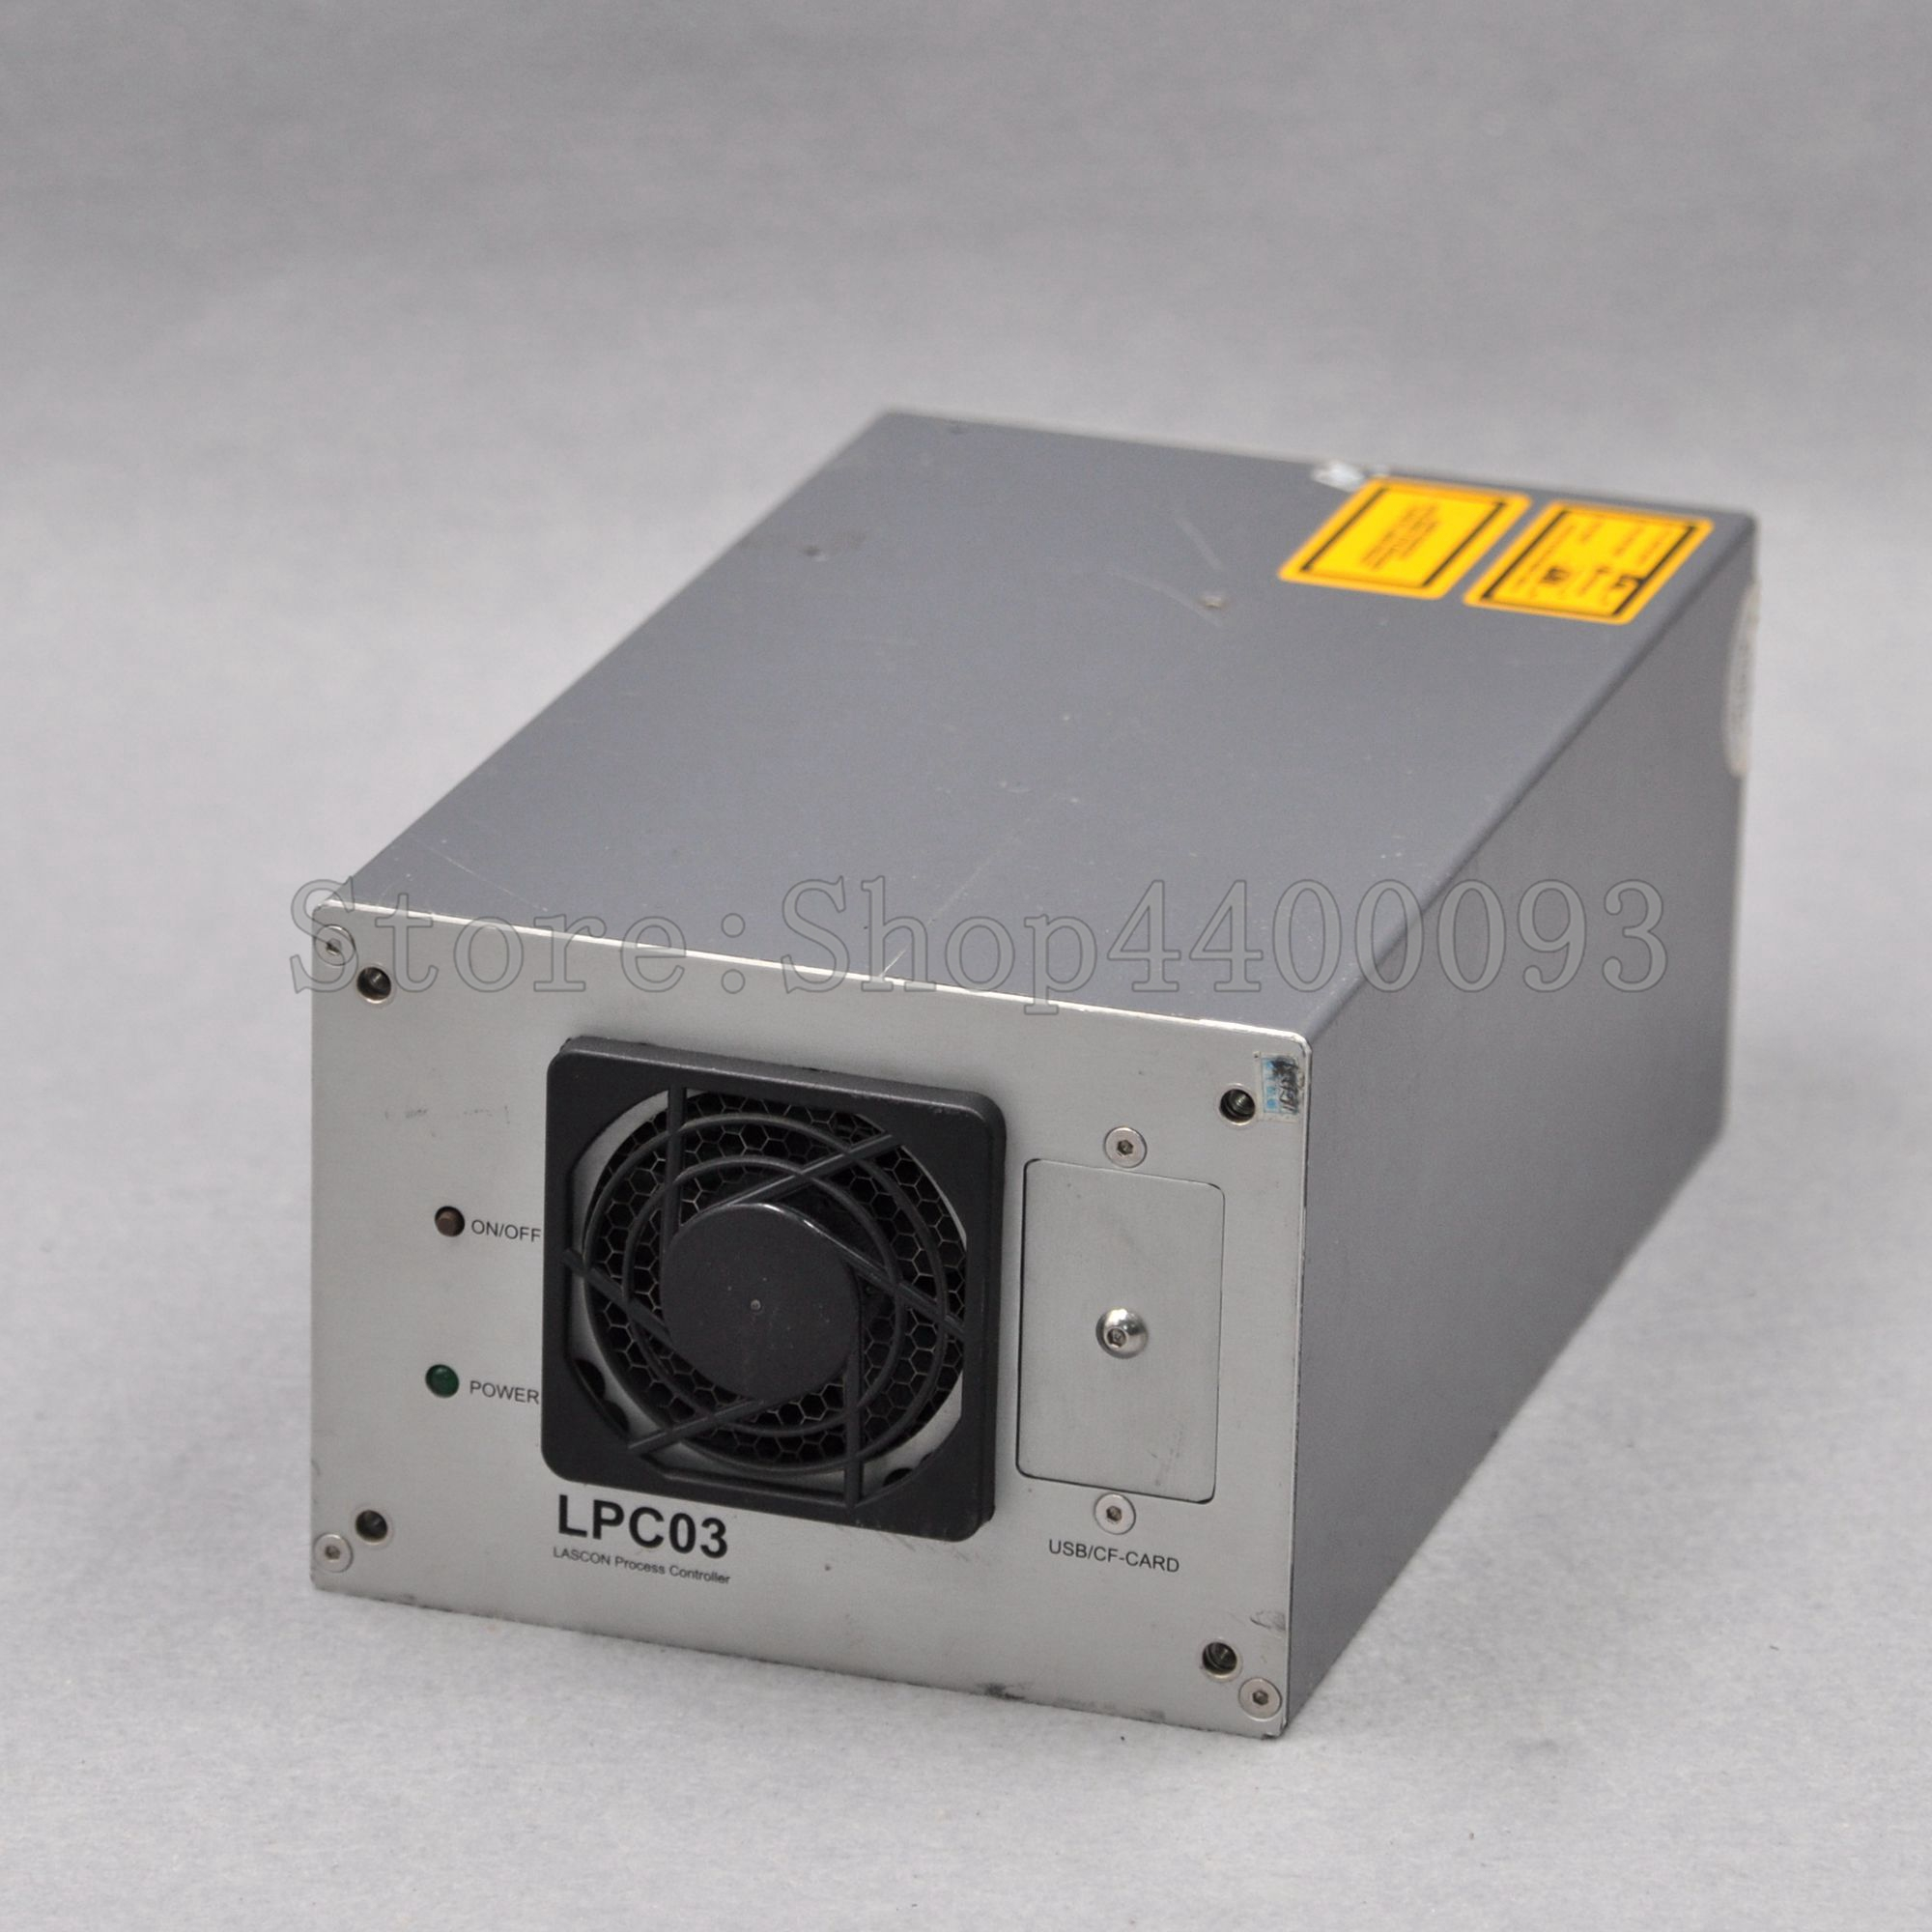 LASCON LPC03 Infrared Pyrometer 24VDC 5DC Maximum Power 5MW Wavelength 650nm